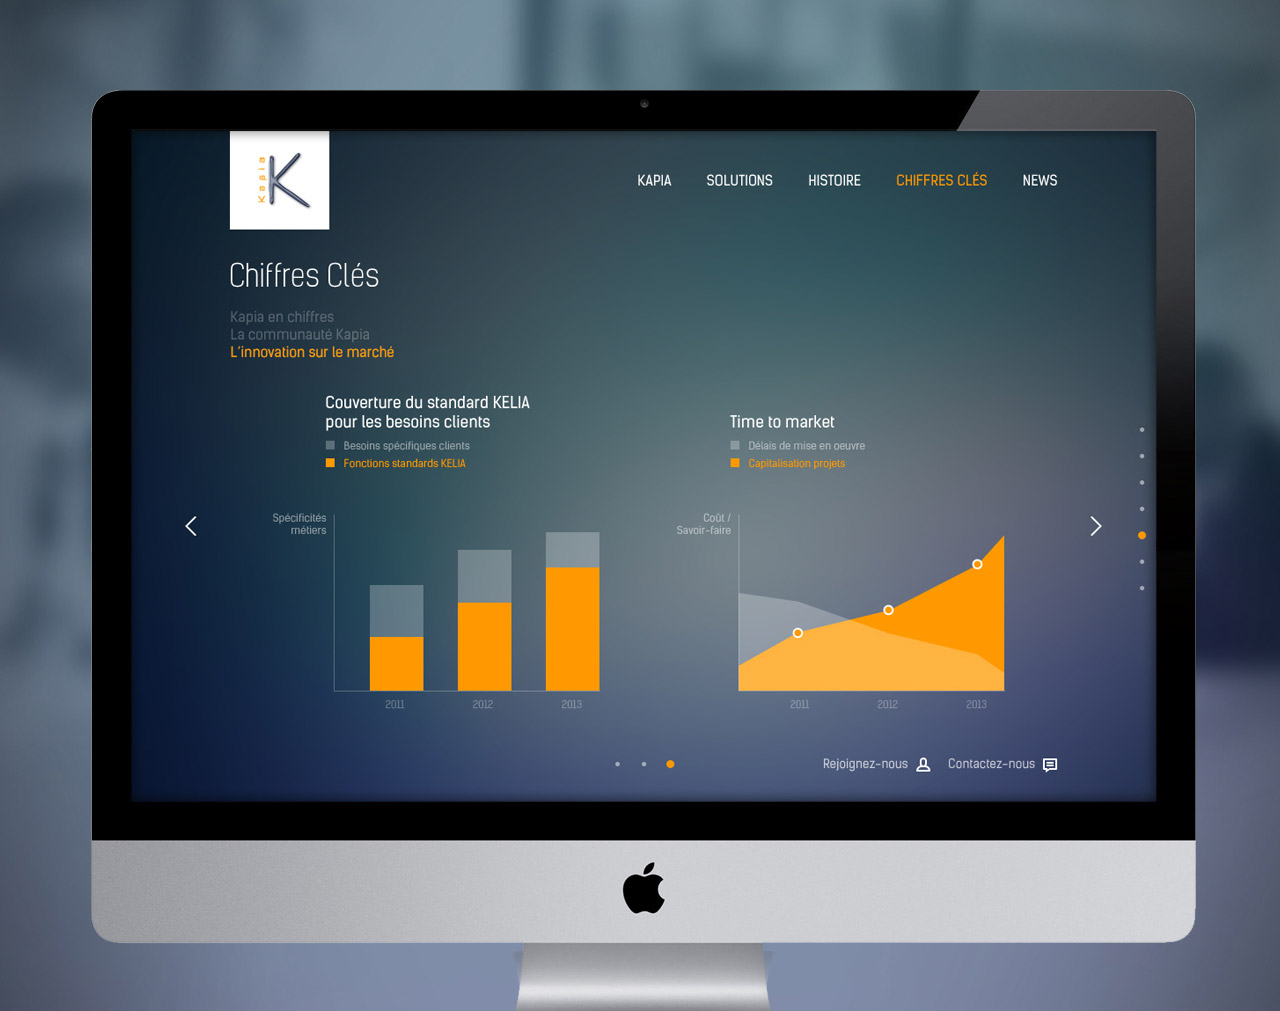 kapia-solutions-chiffres-3-site-internet-responsive-design-creation-communication-caconcept-alexis-cretin-graphiste